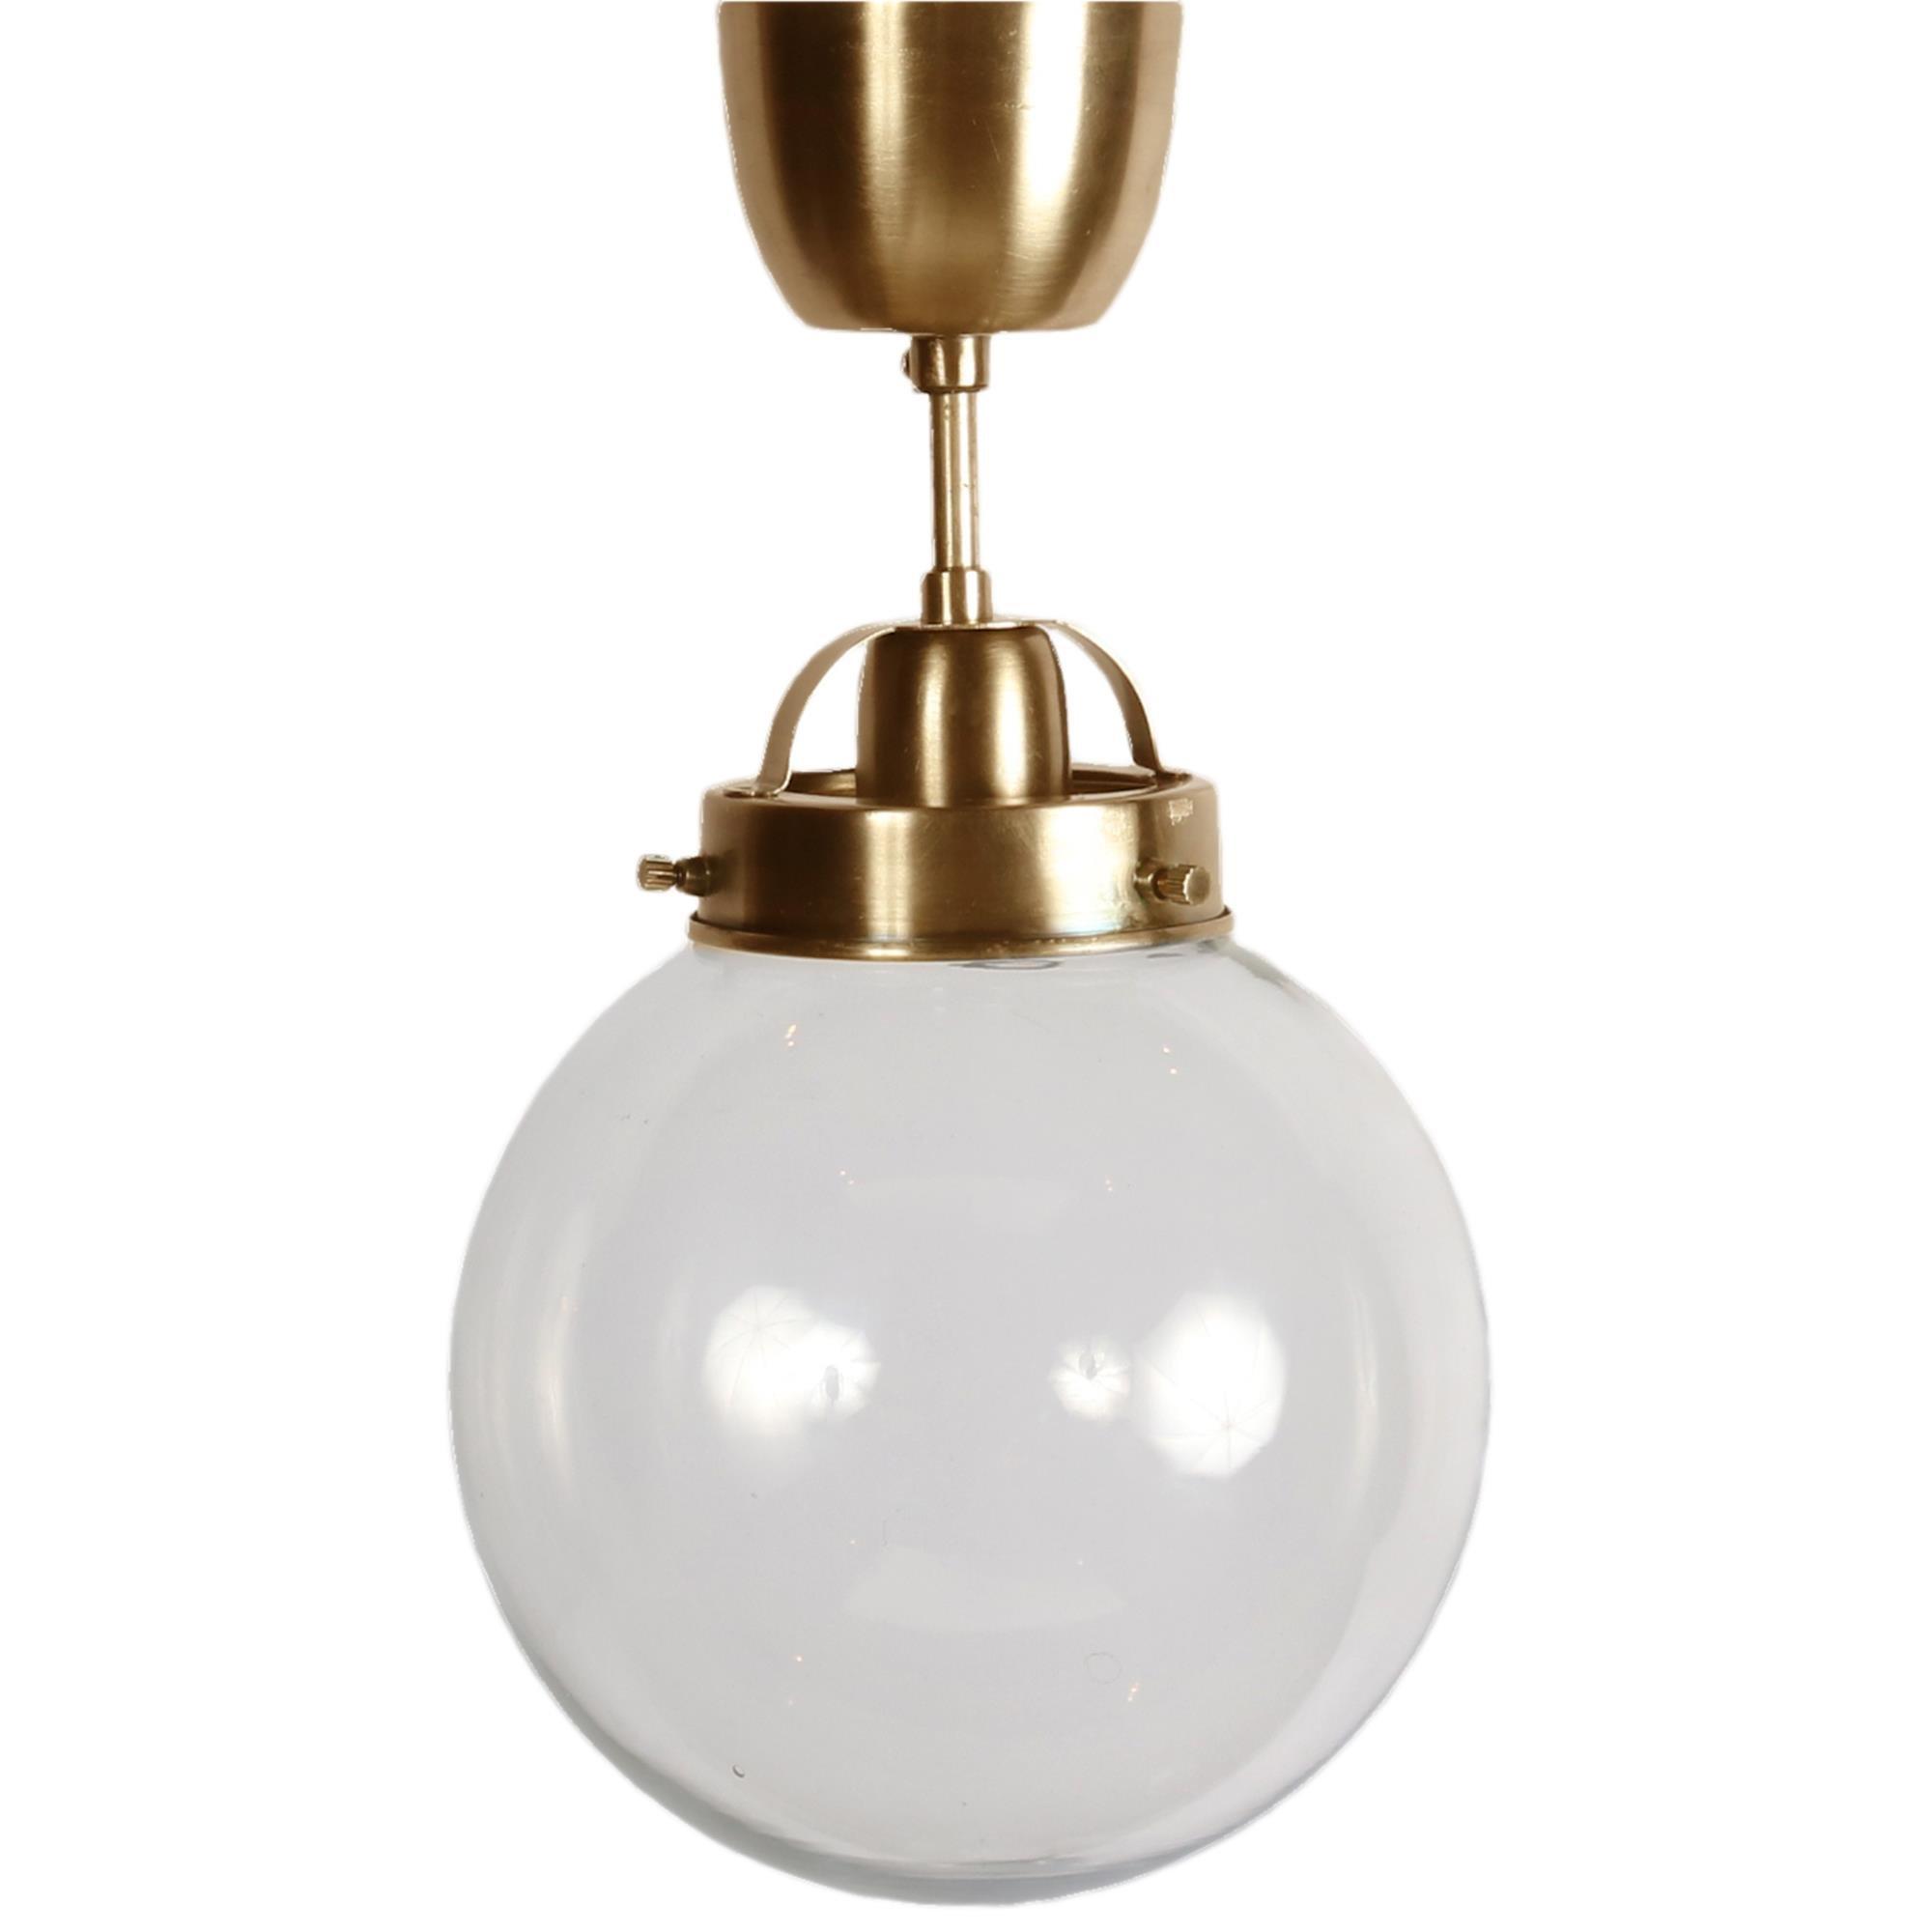 Lampa Sufitowa Szklana Kula Bretagne 20cm